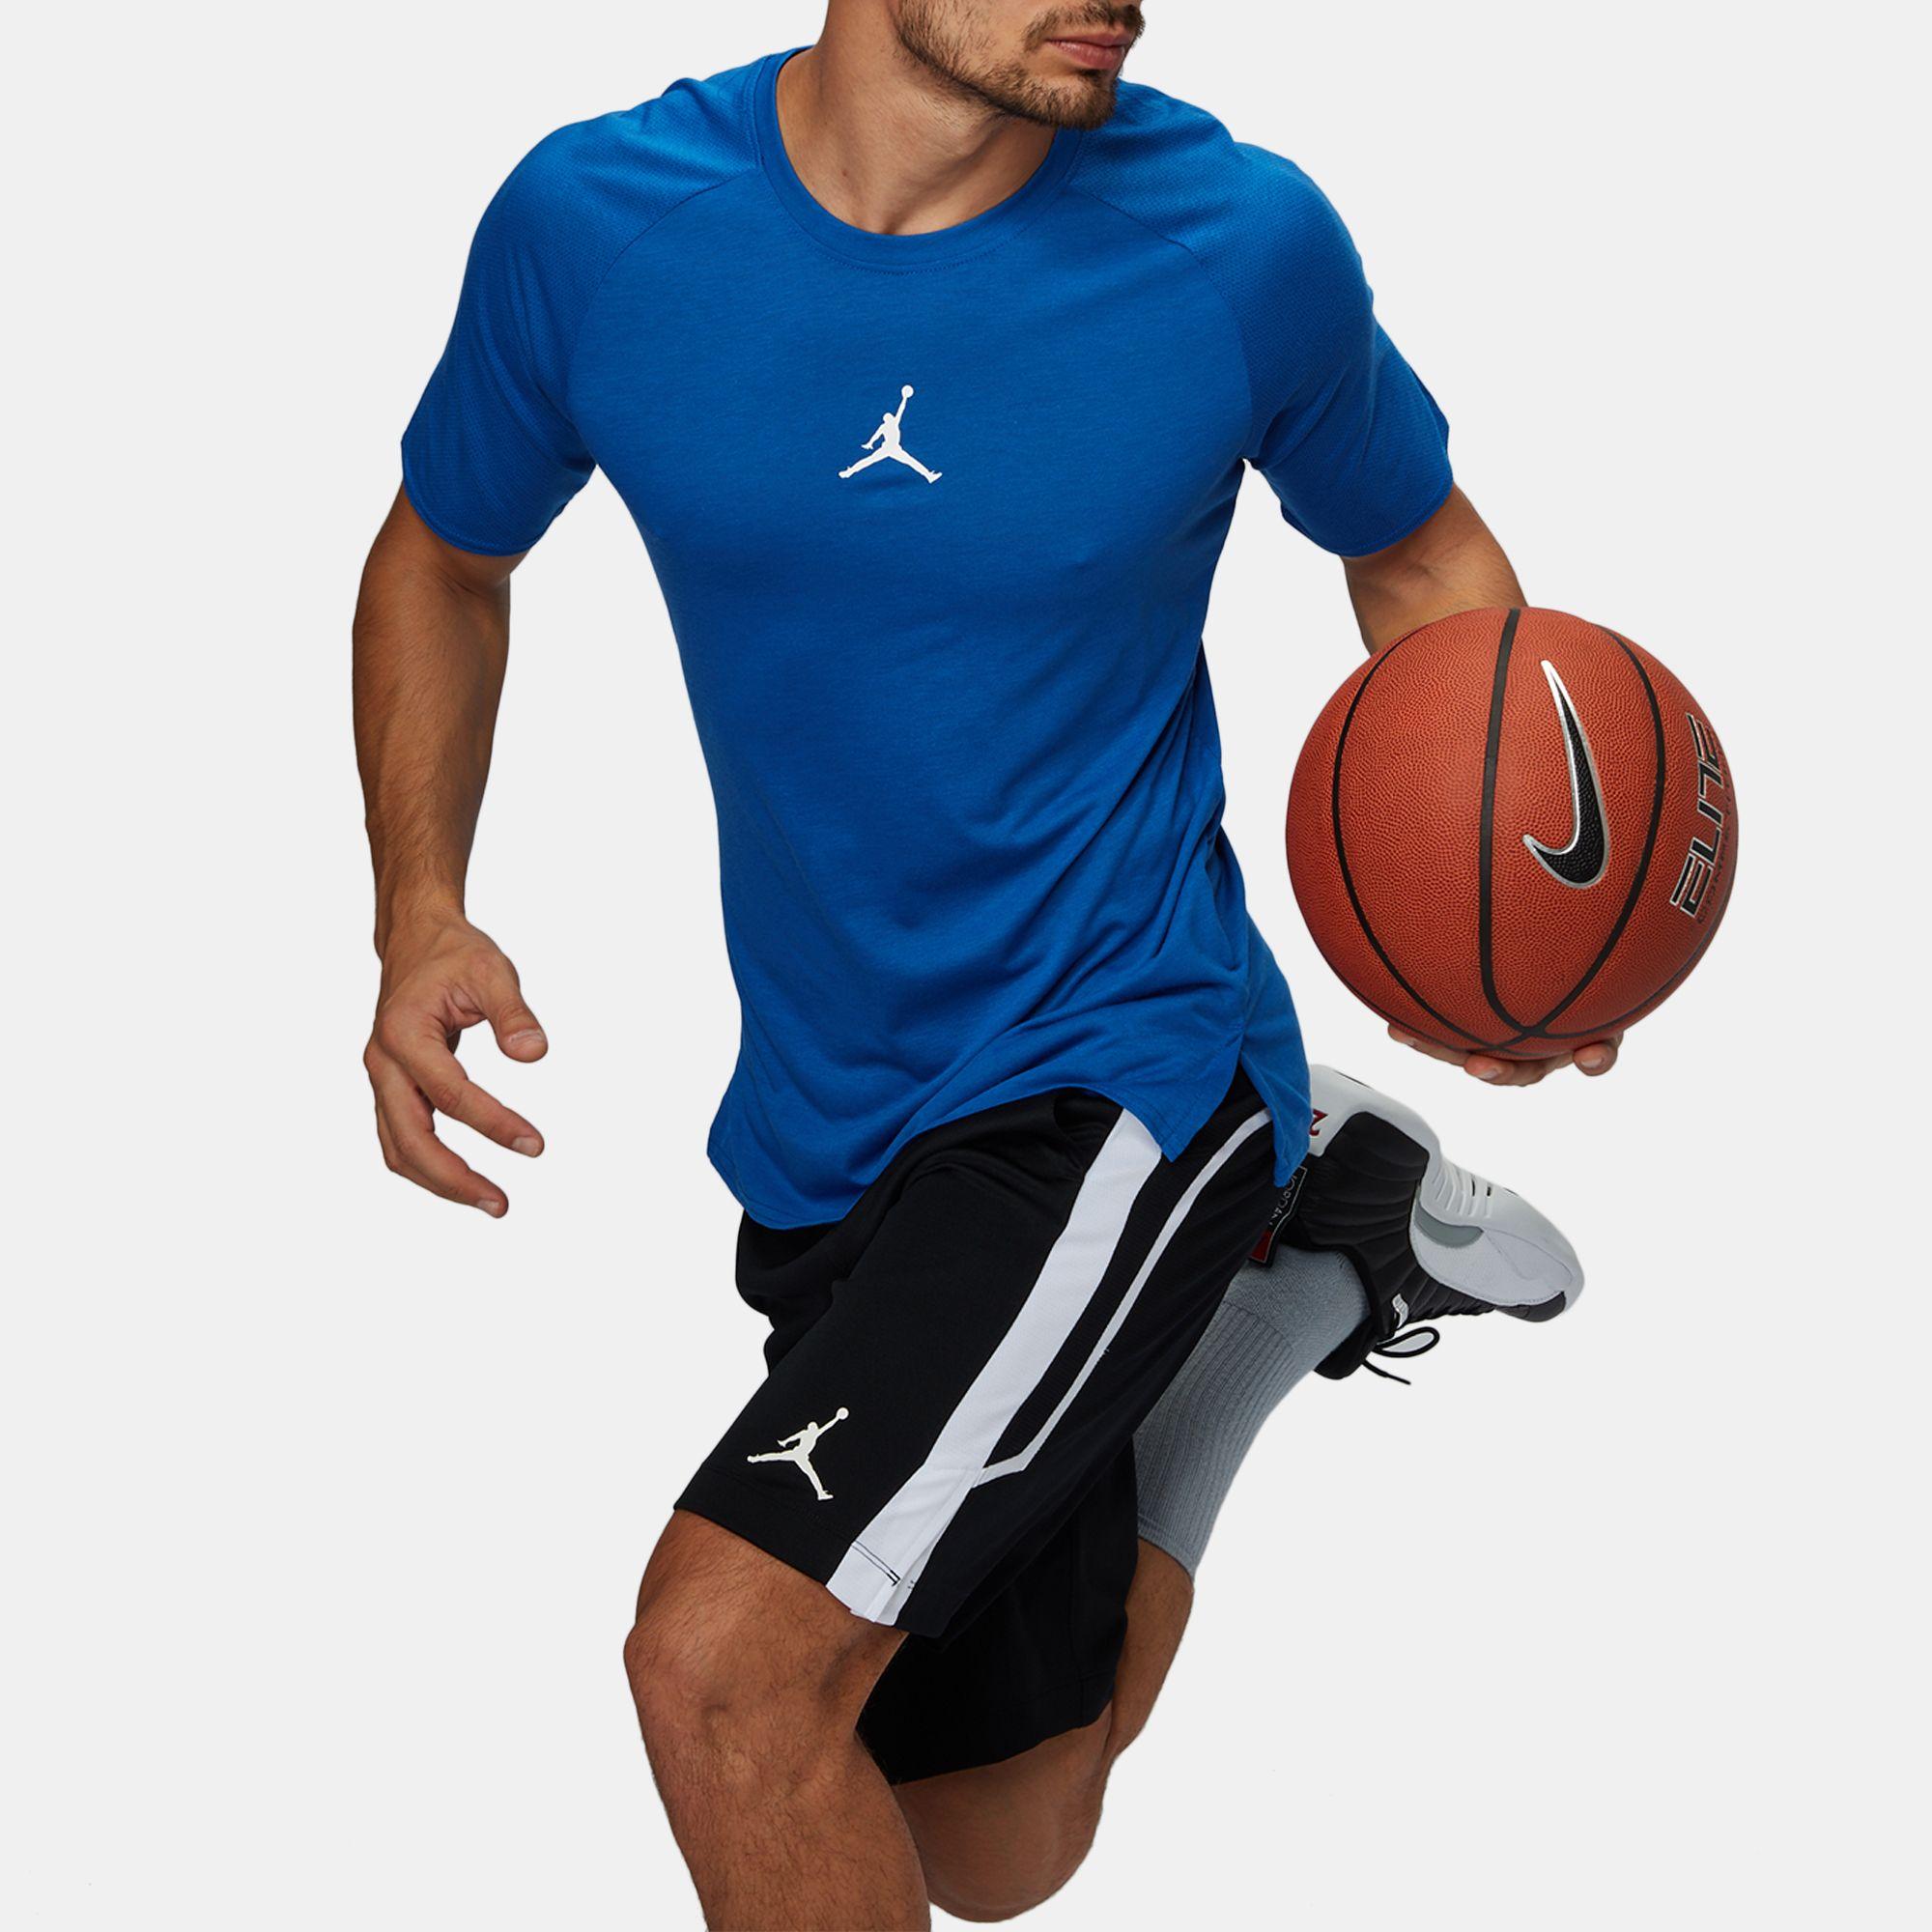 a20be0d31b0f61 Shop Blue Jordan Dri-FIT 23 Alpha Training T-Shirt for Mens by ...